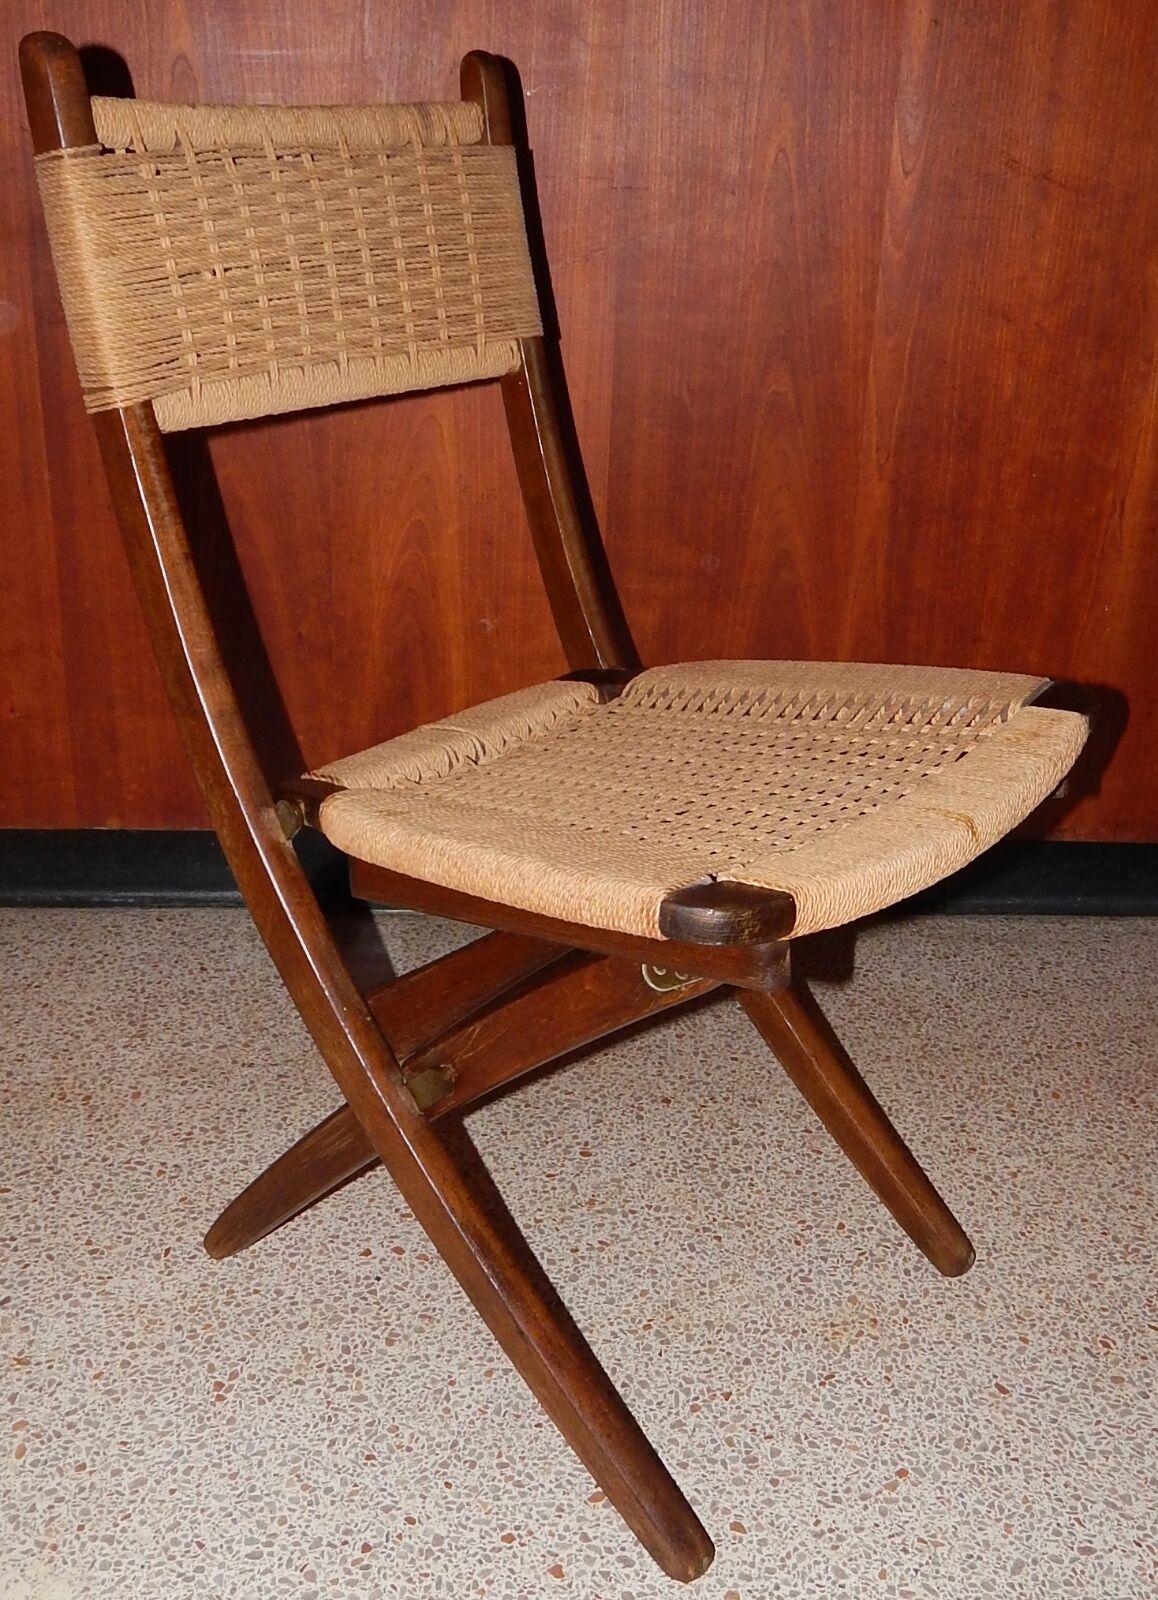 yugoslavian folding chair wicker rocking for sale vintage danish modern hans wegner era rope